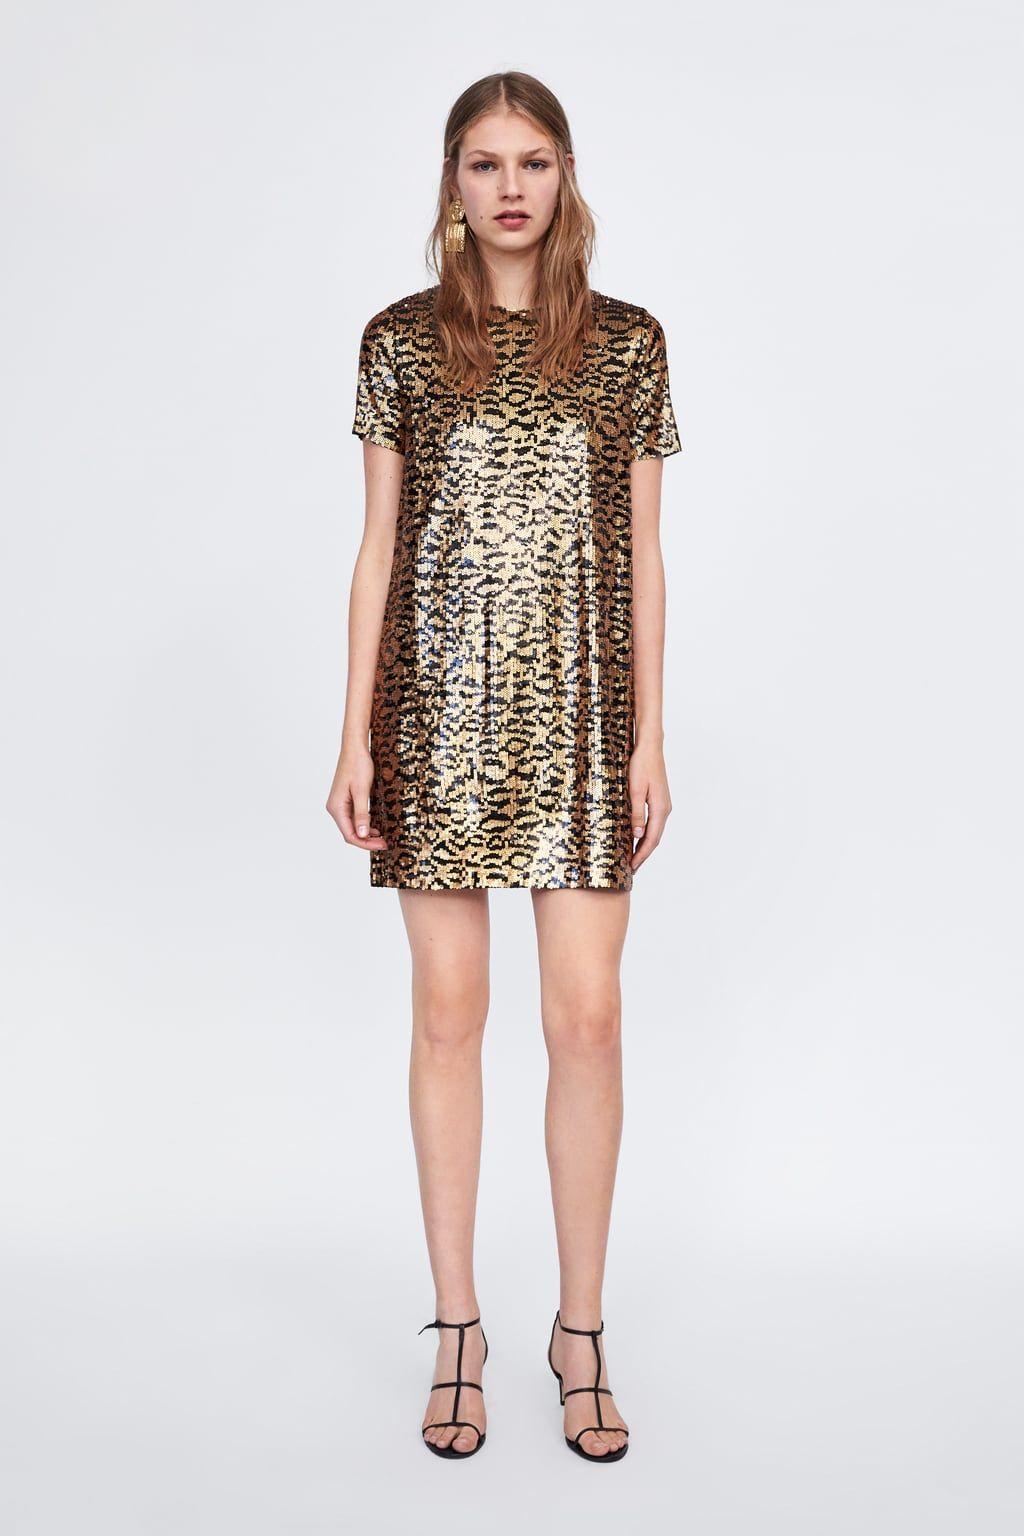 db051bbfb3 Animal print sequin dress | Bodacious Bridesmaids | Sequin dress ...